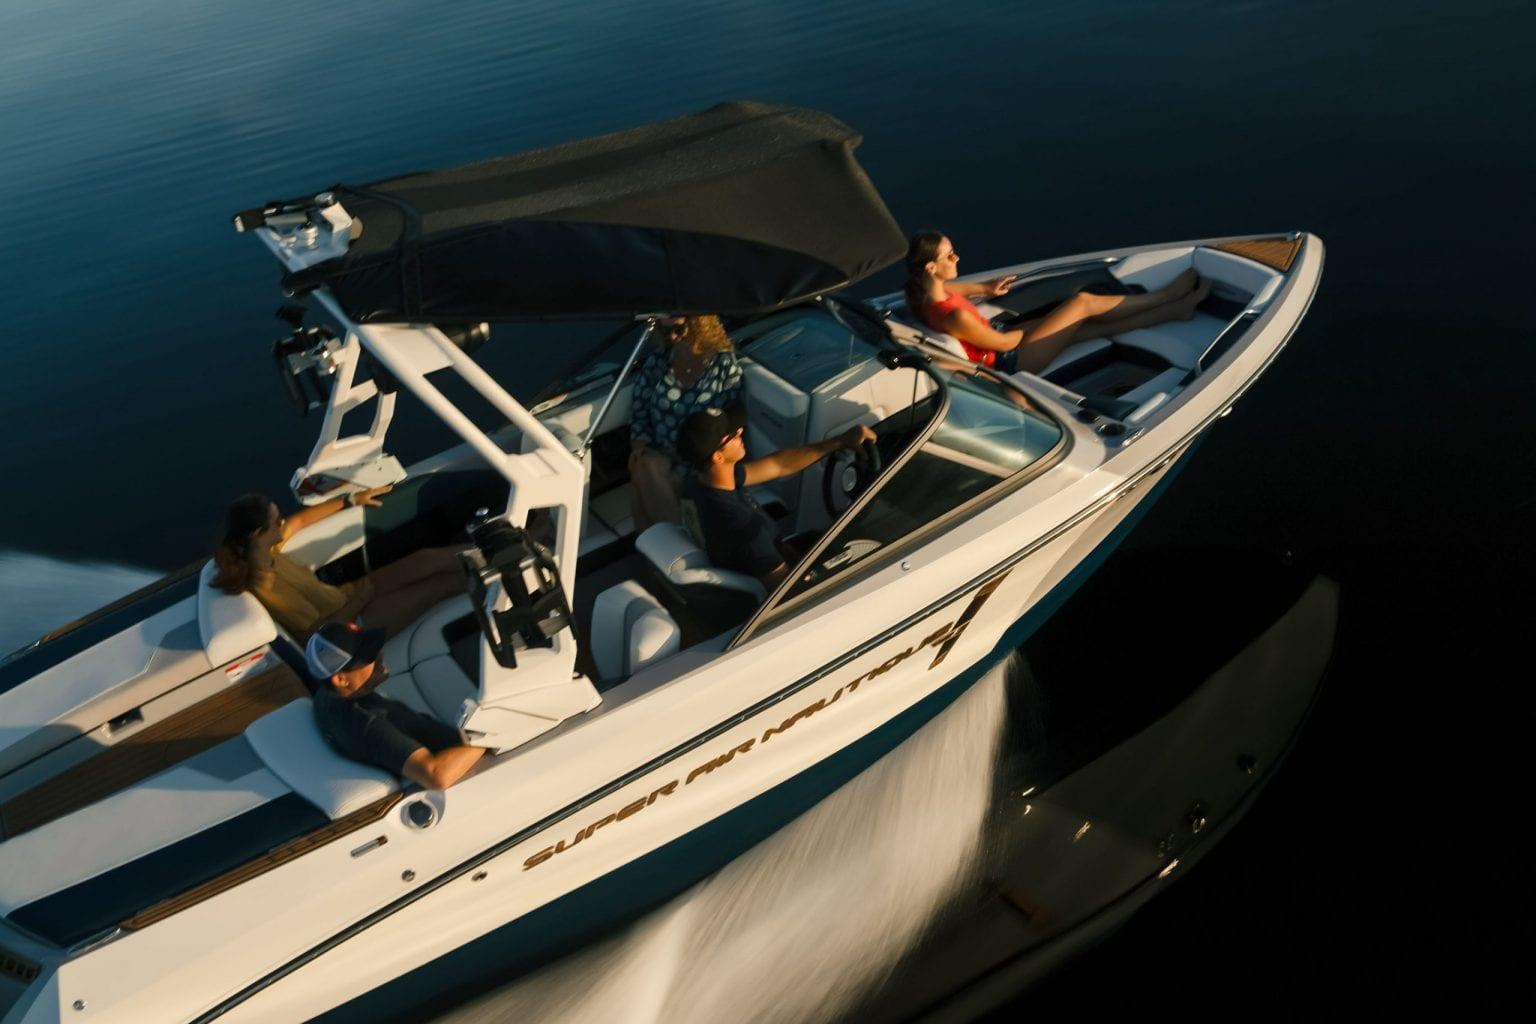 סירת ספורט - וויקסרף וויקבורד SUPER AIR NAUTIQUE 210 - סטרים יאכטות